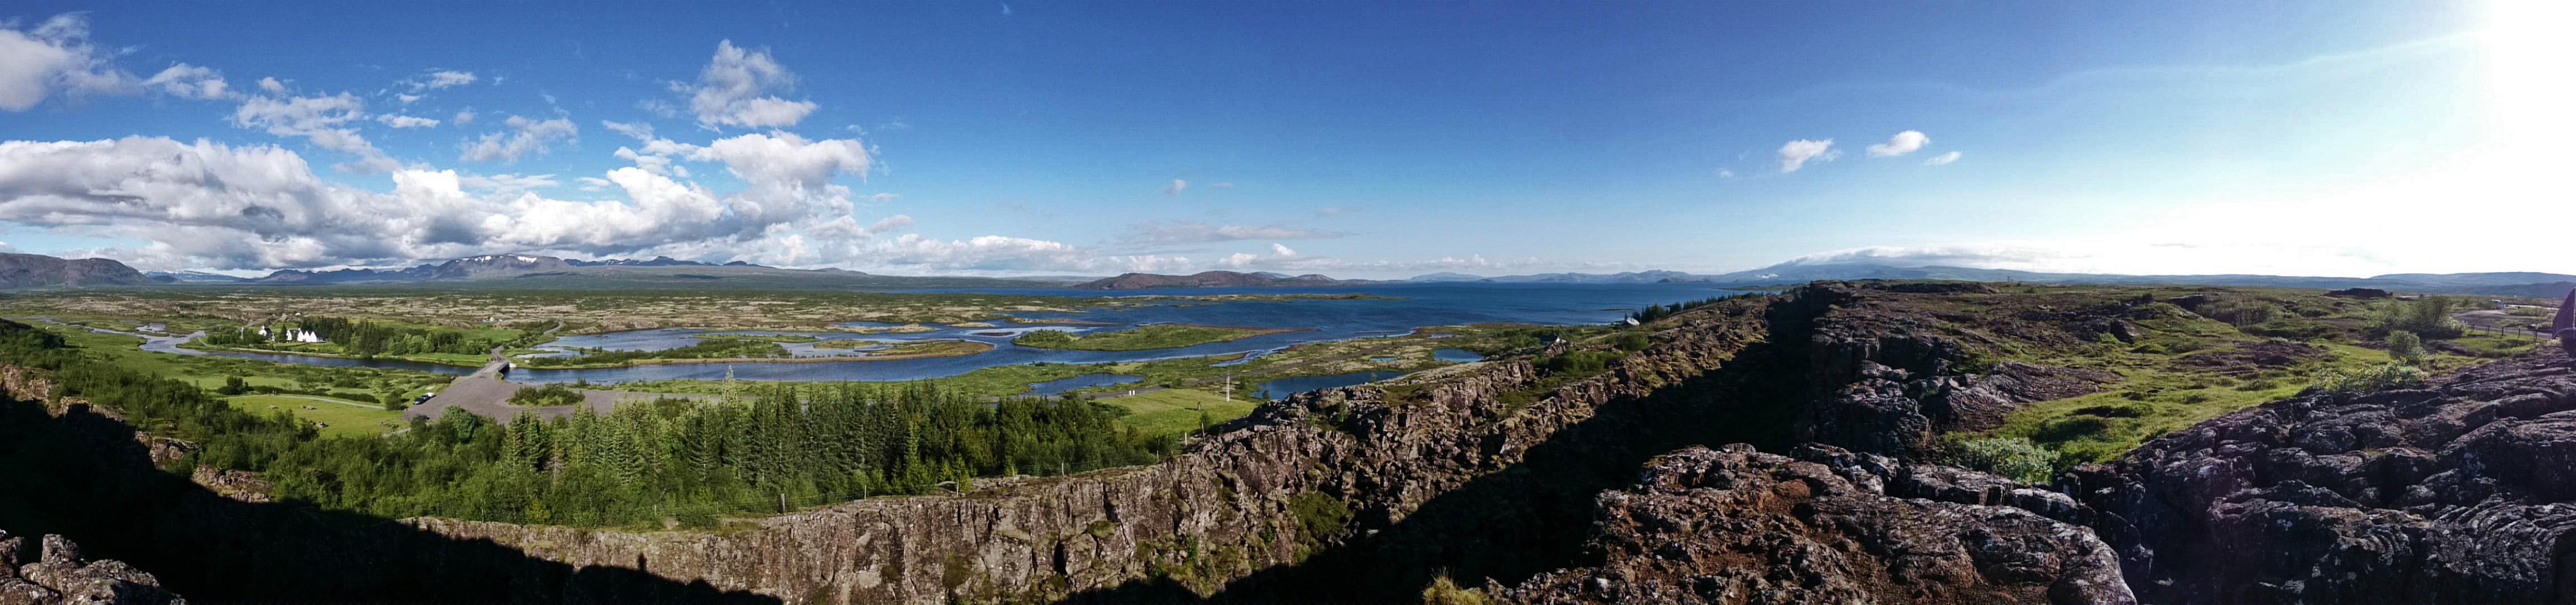 04. Þingvellir II